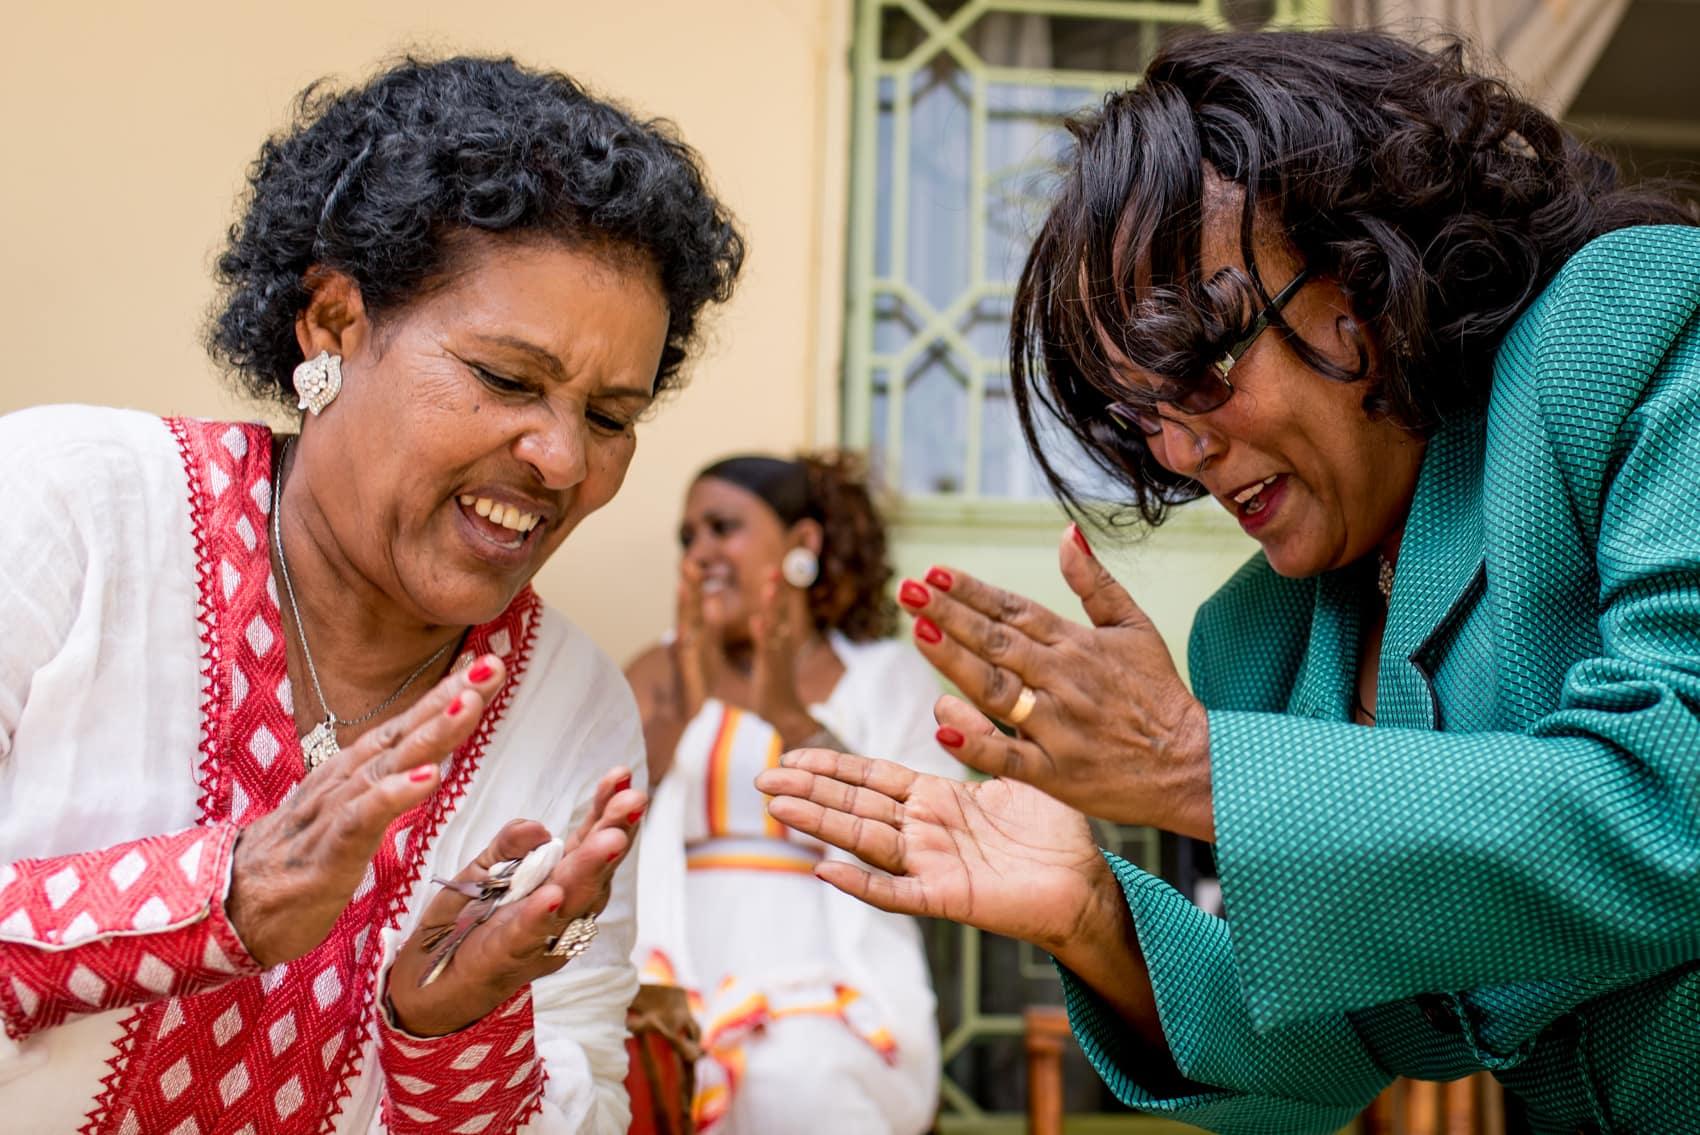 Ethiopian Wedding Hairstyles The Hippest Pics